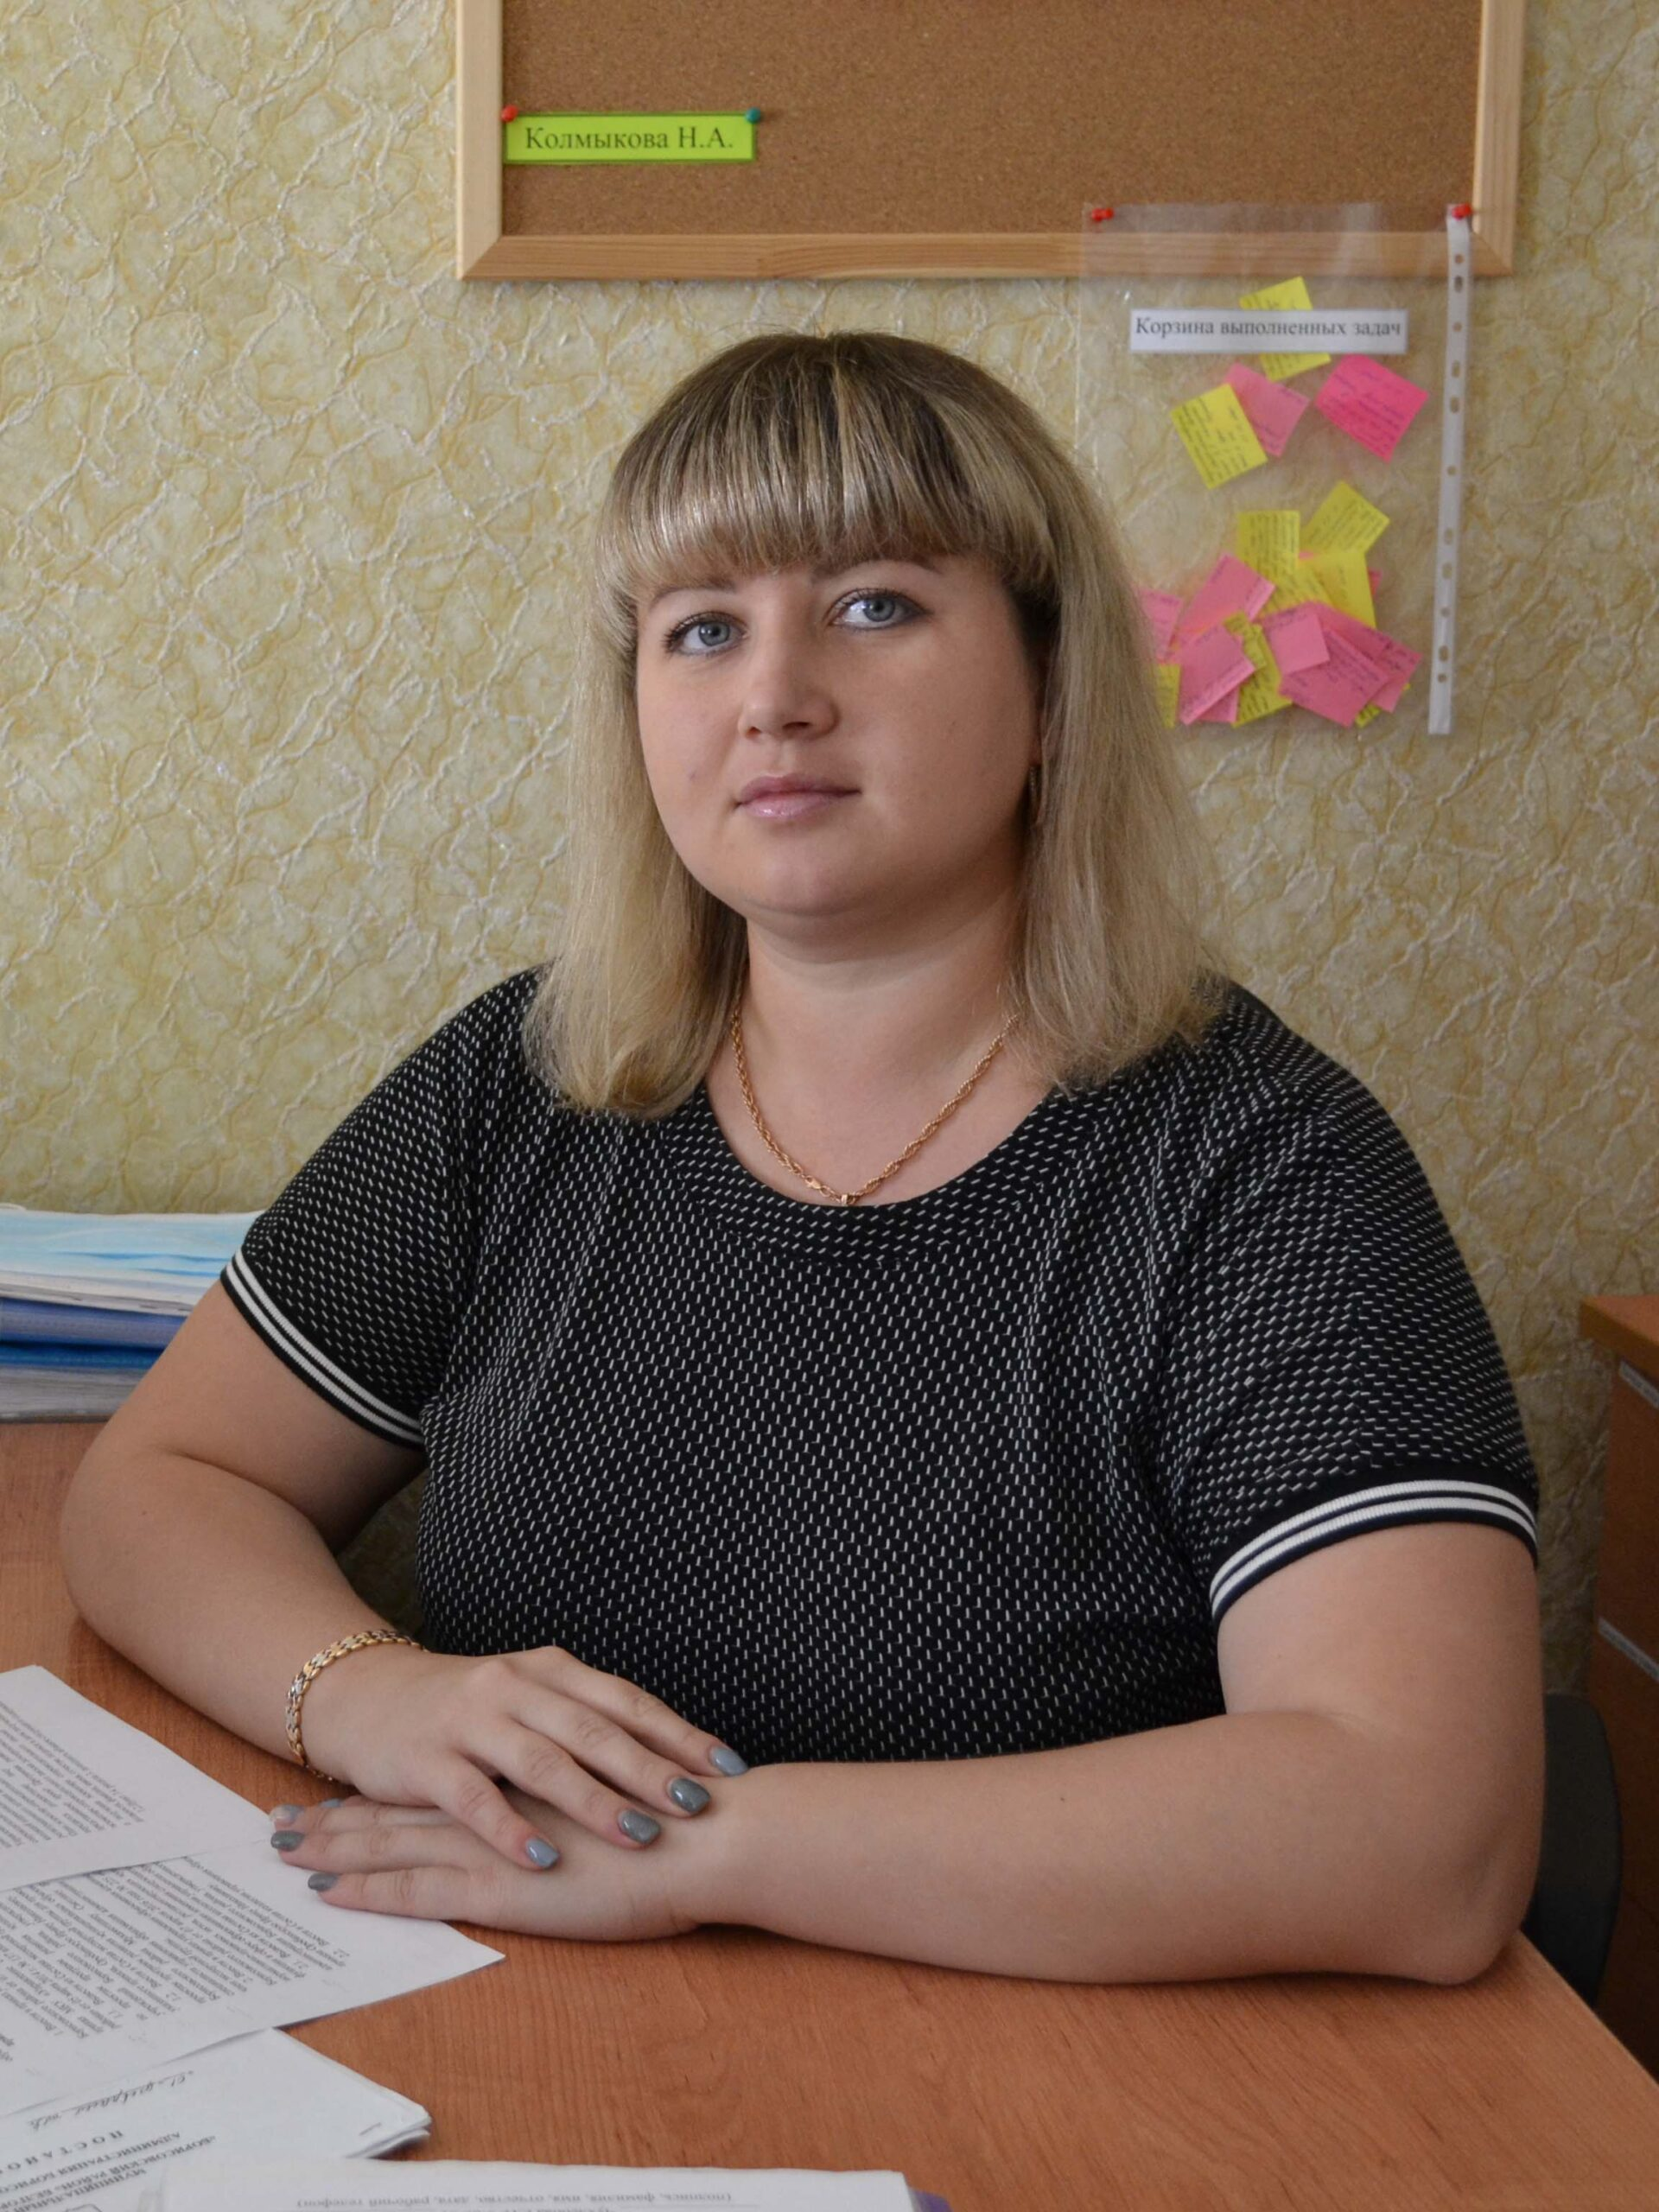 Белоус Ольга Андреевна